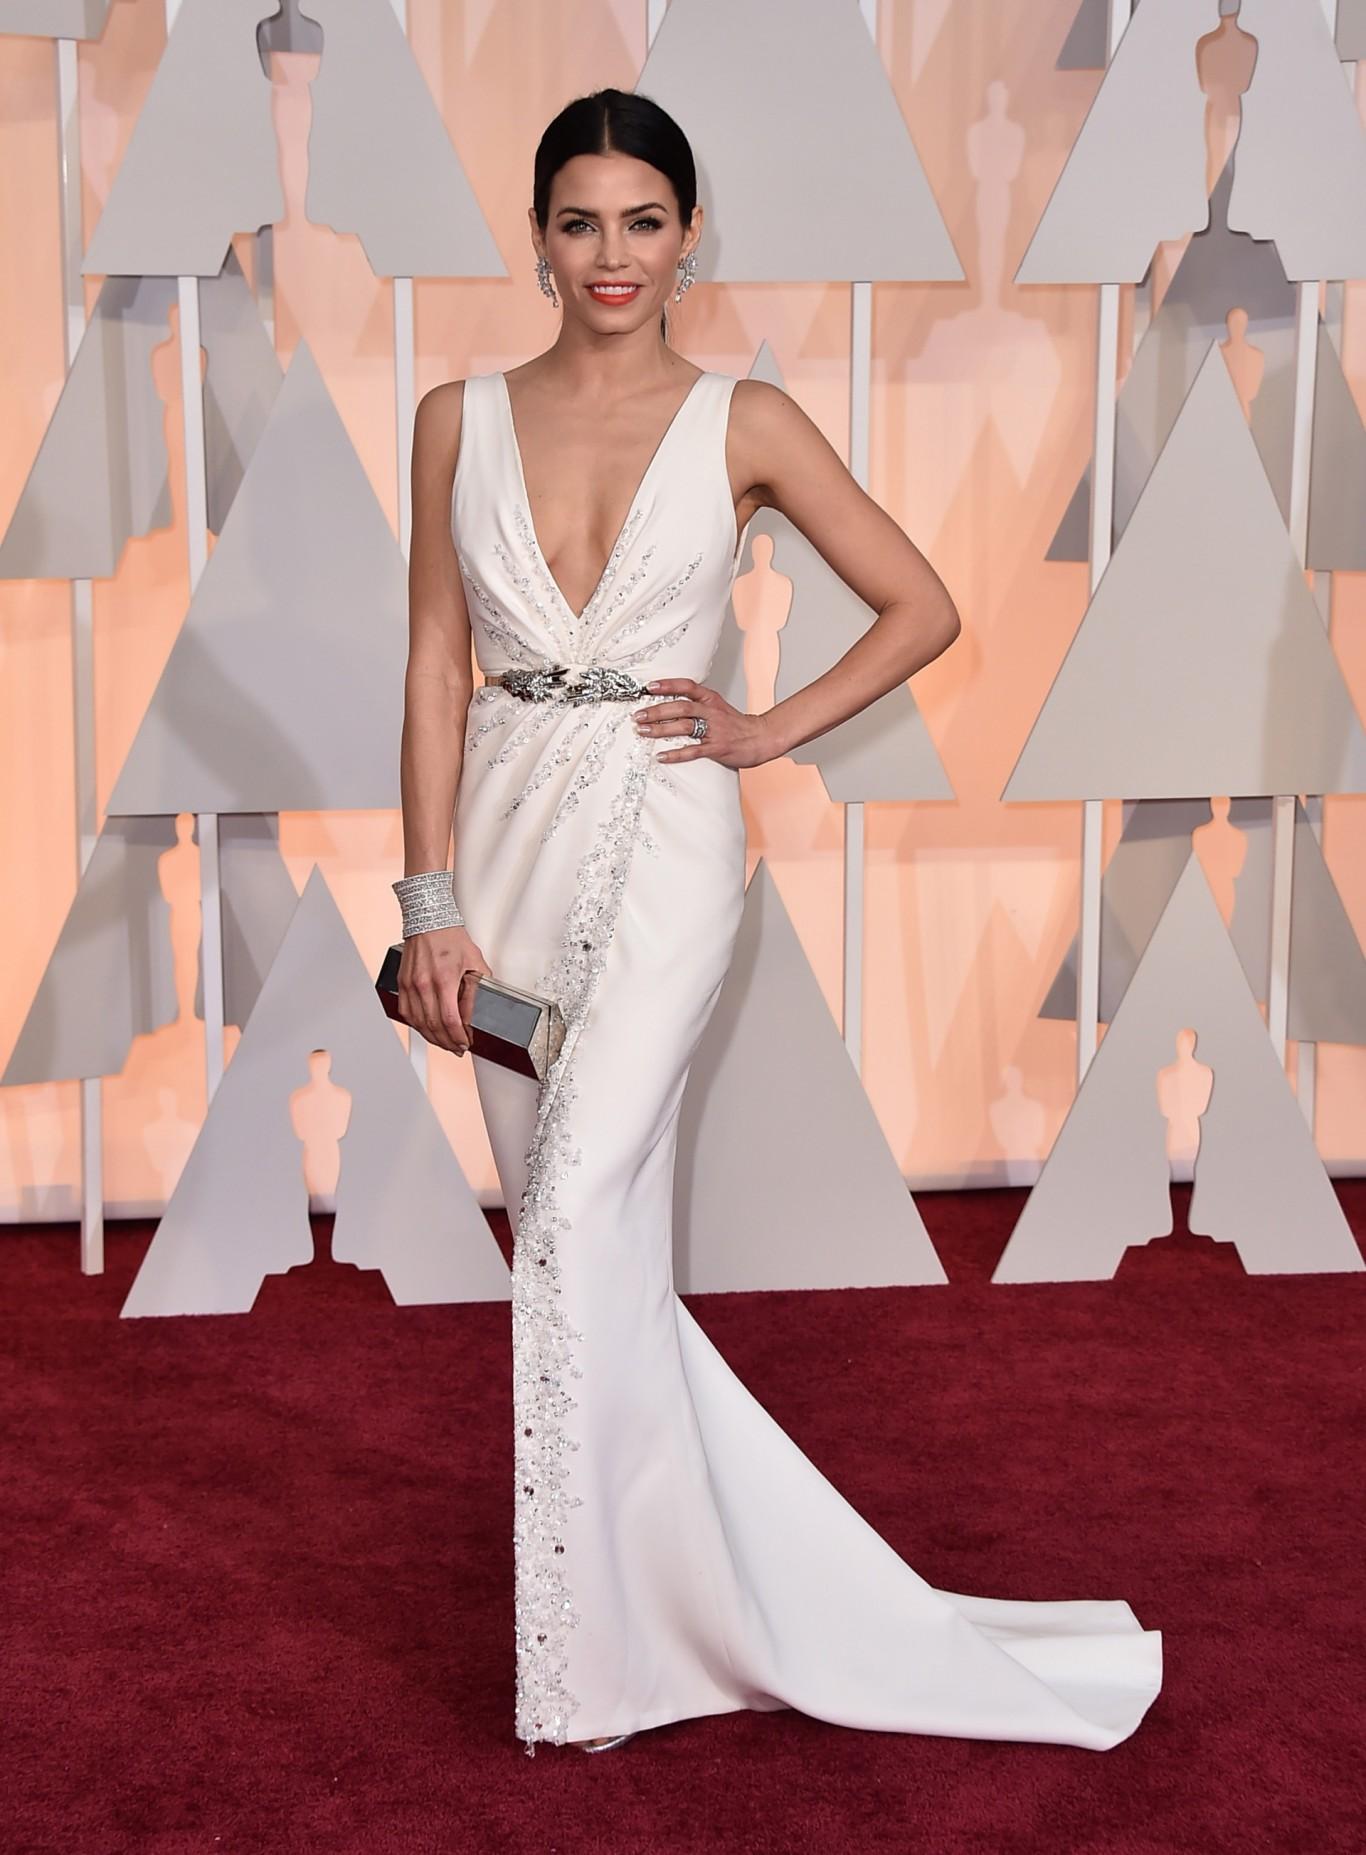 Jenna Dewan Tatum: See the best dressed at 2015 Oscars.